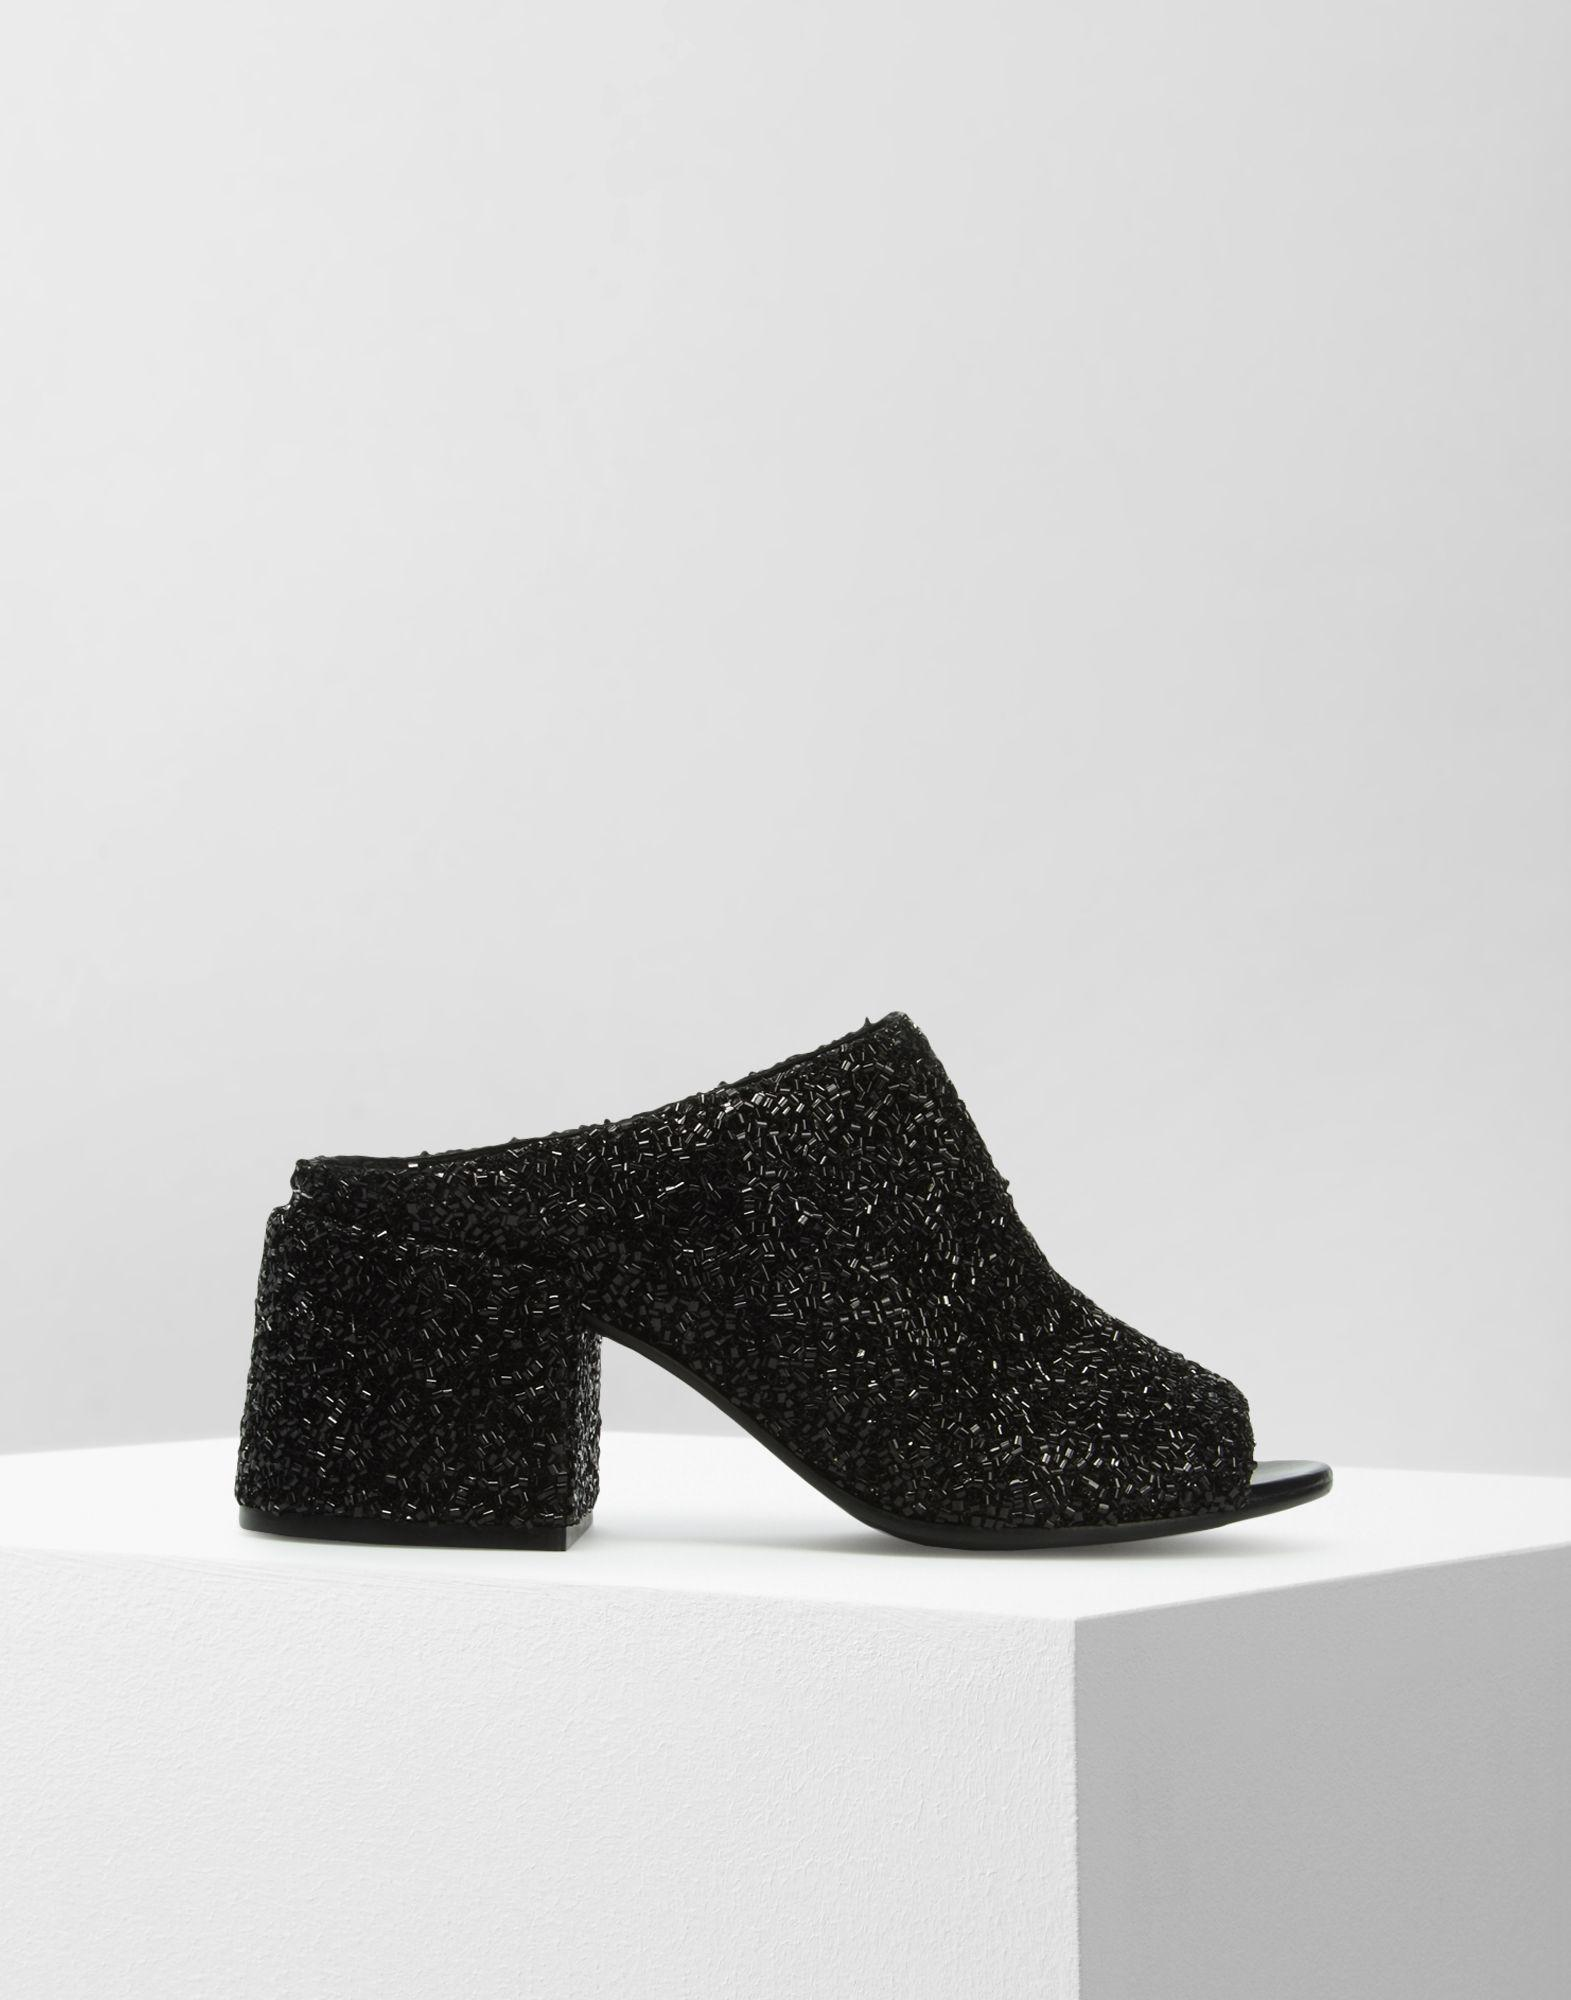 fcf55d64cd89 Lyst - MM6 by Maison Martin Margiela Beaded Mid-heel Mules in Black